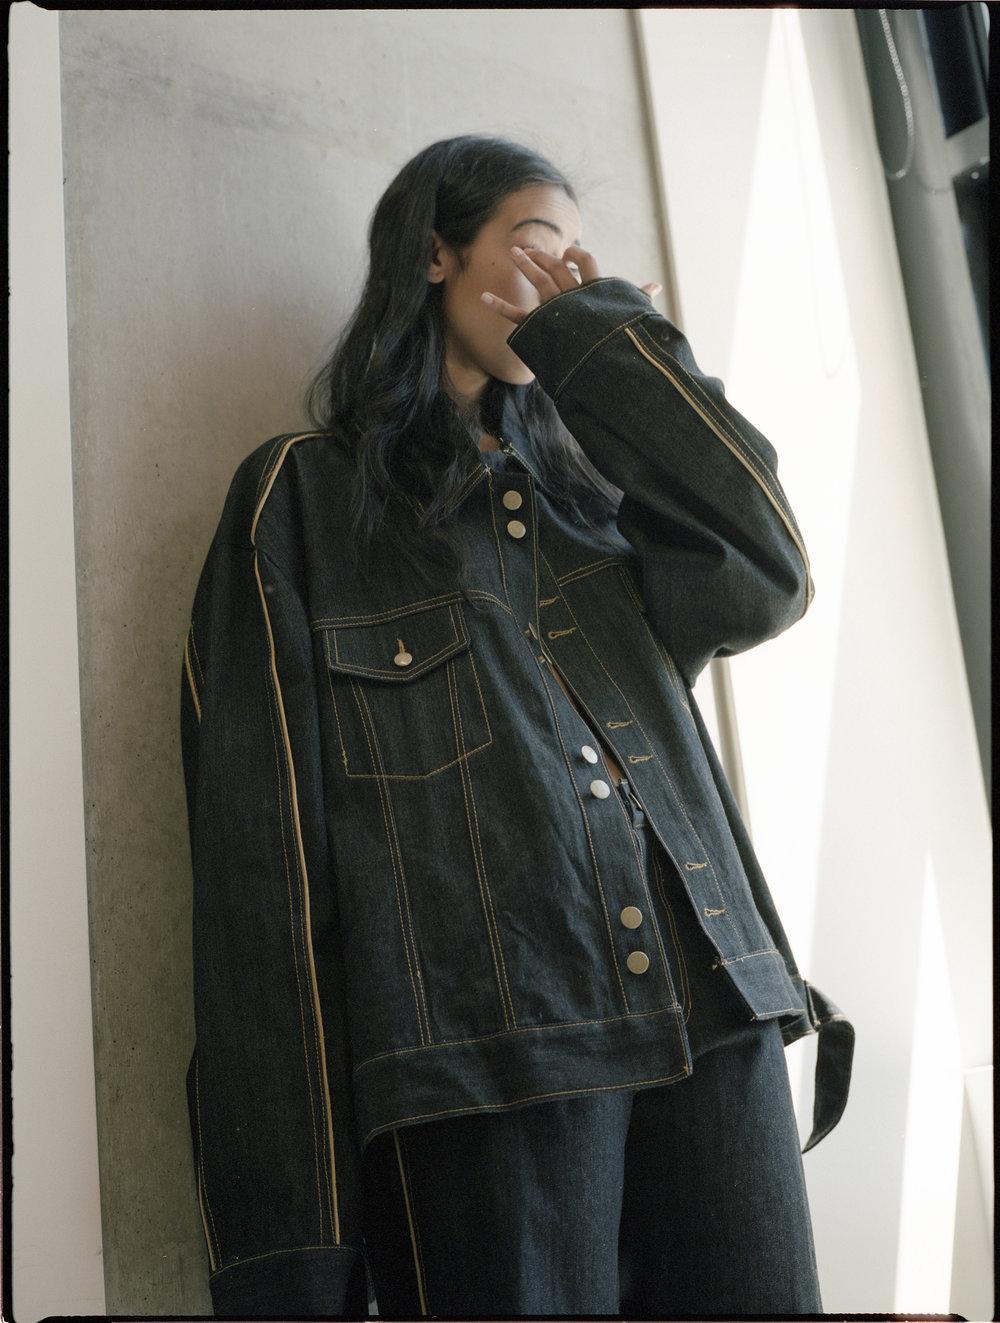 Denim jacket and jeans ALEXANDRA KIRWOOD.